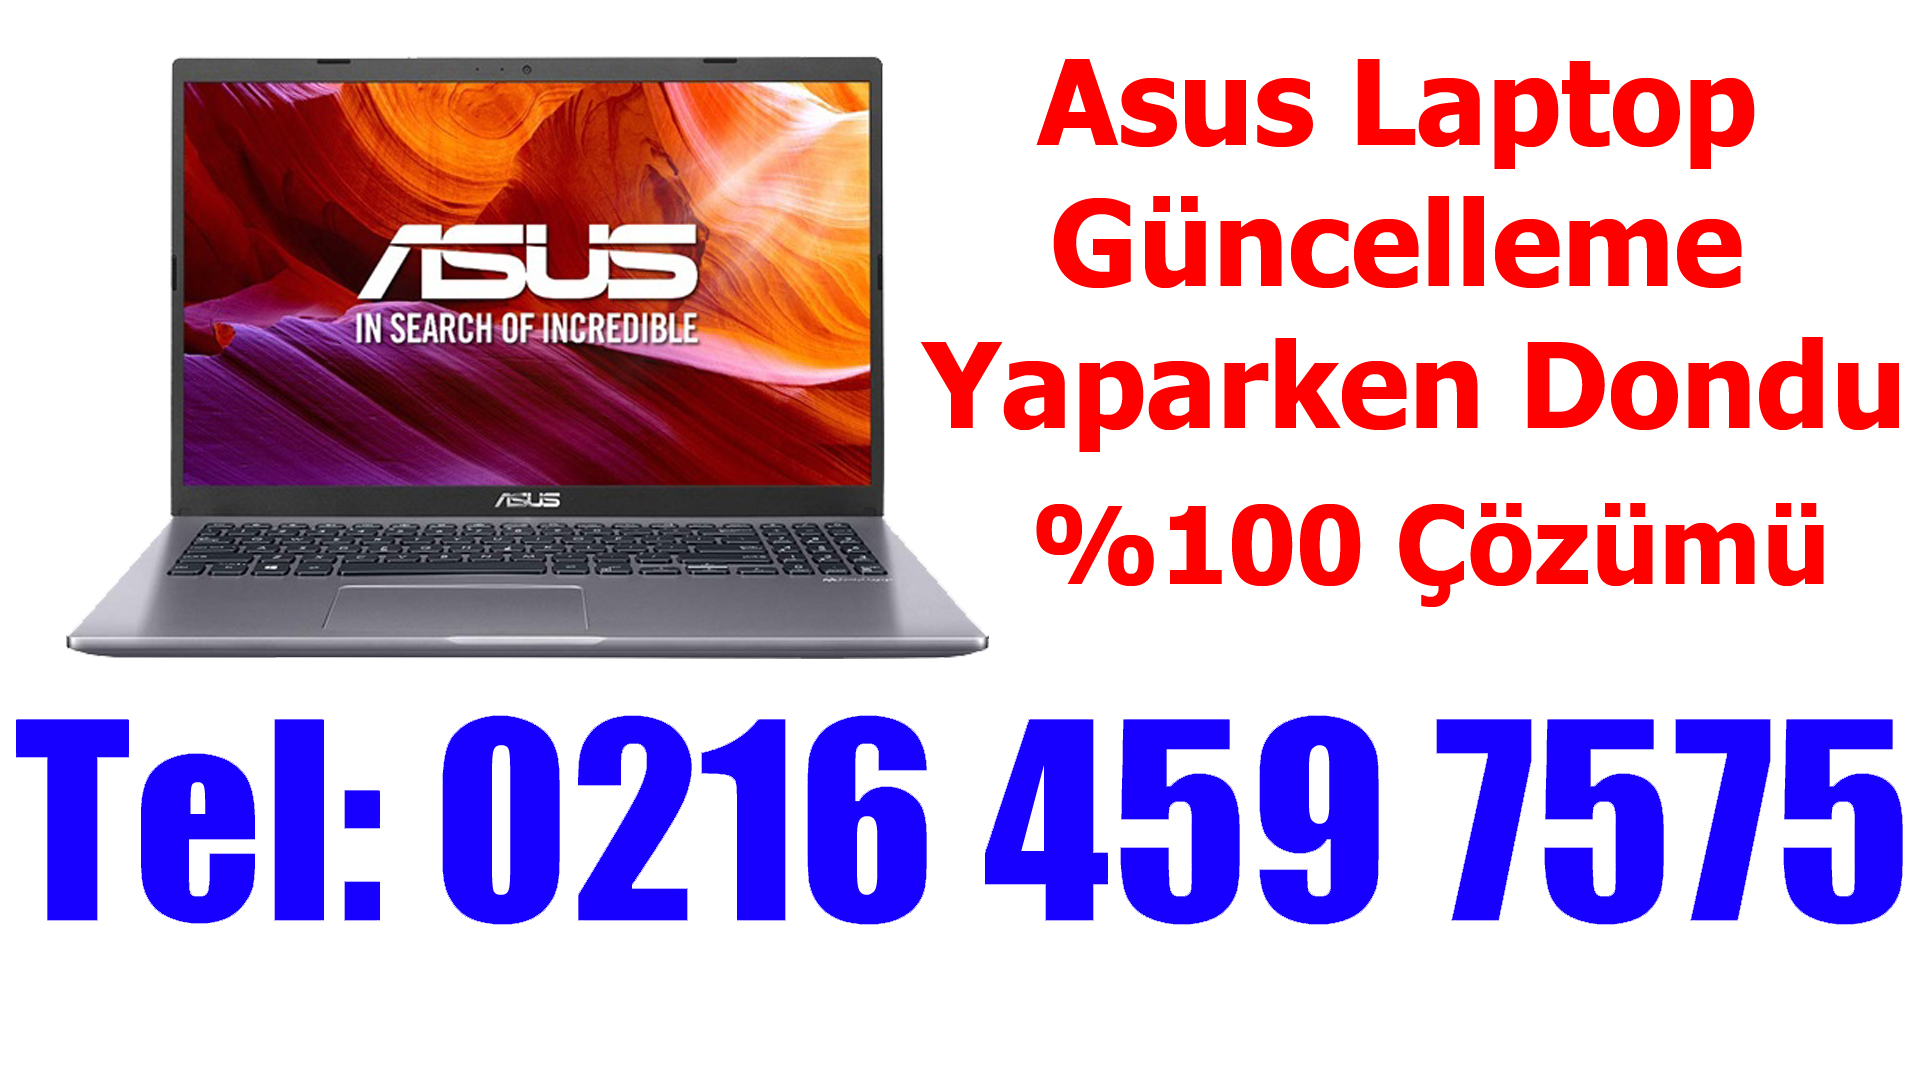 Asus Laptop Güncelleme Yaparken Dondu